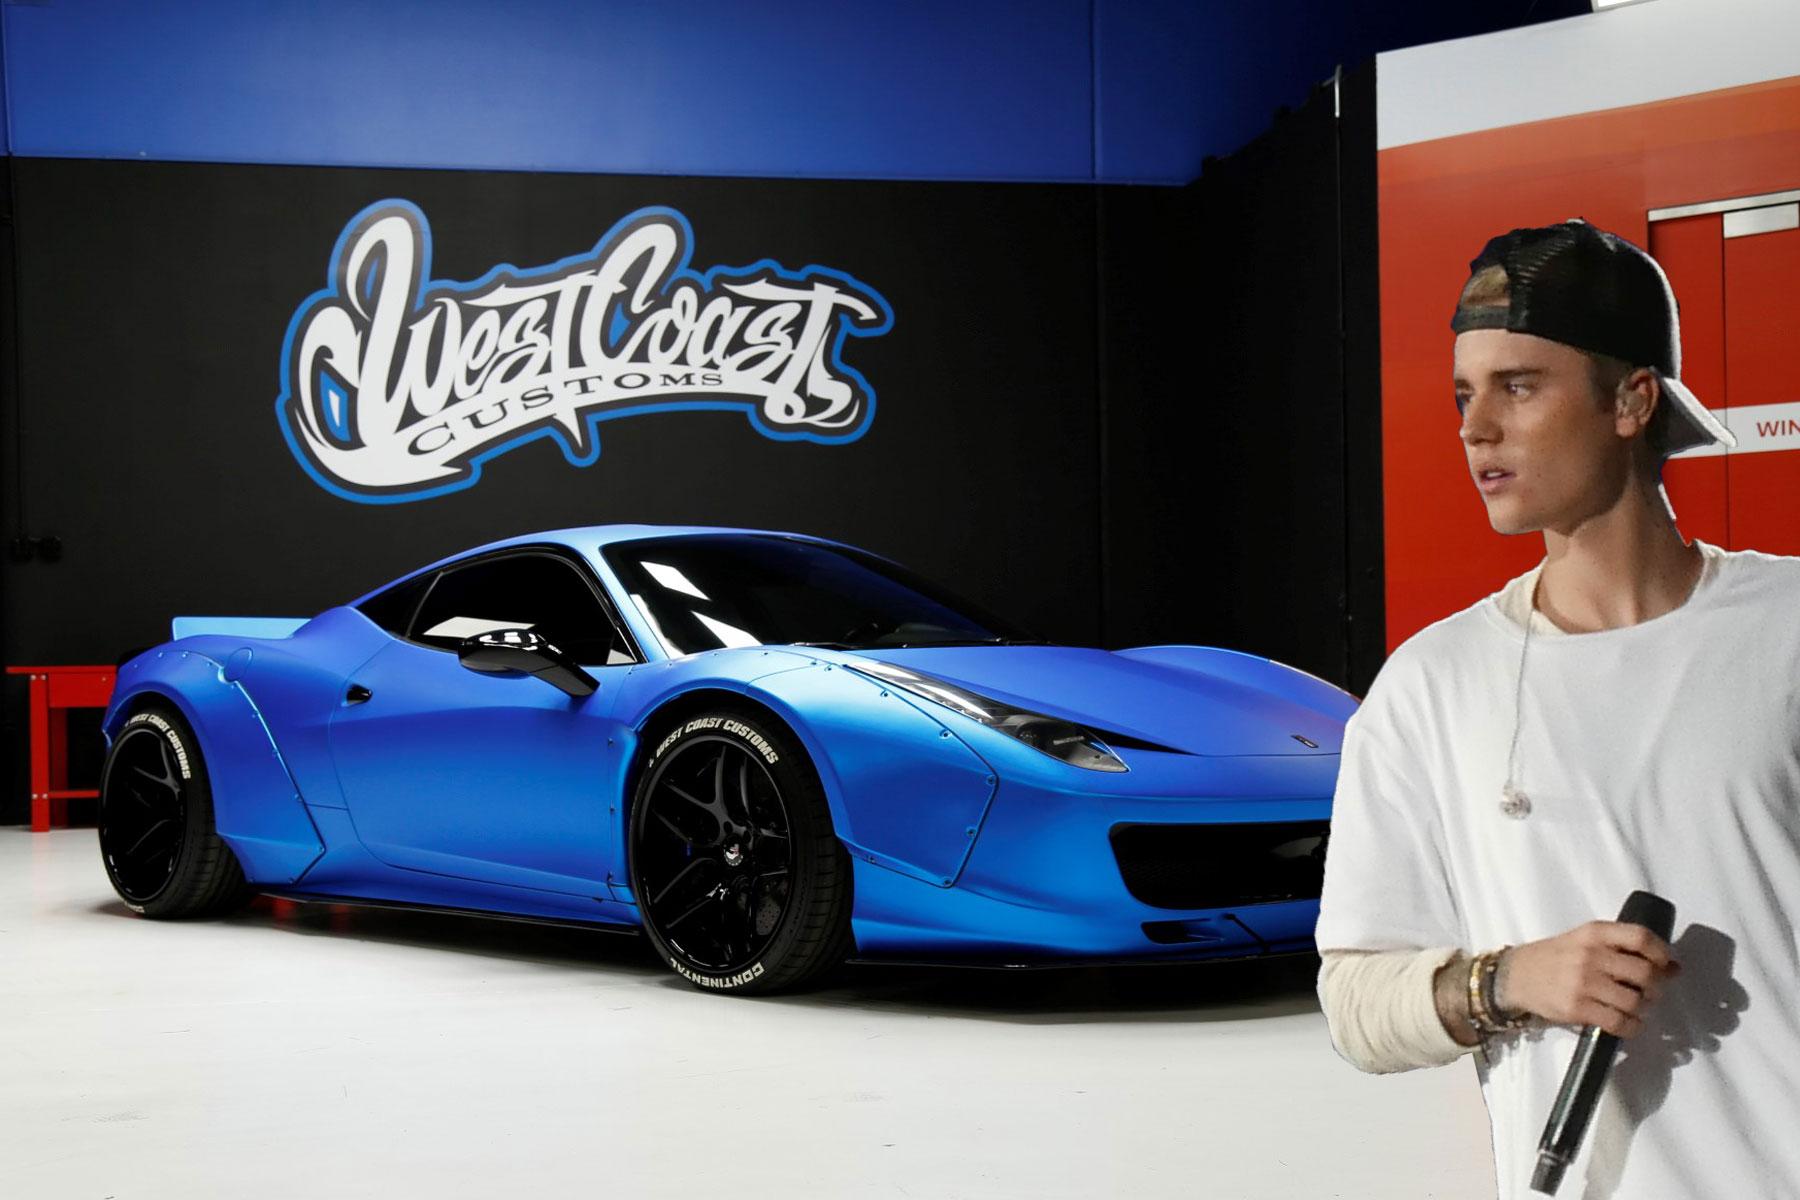 Justin Bieber is selling his modified Ferrari 458